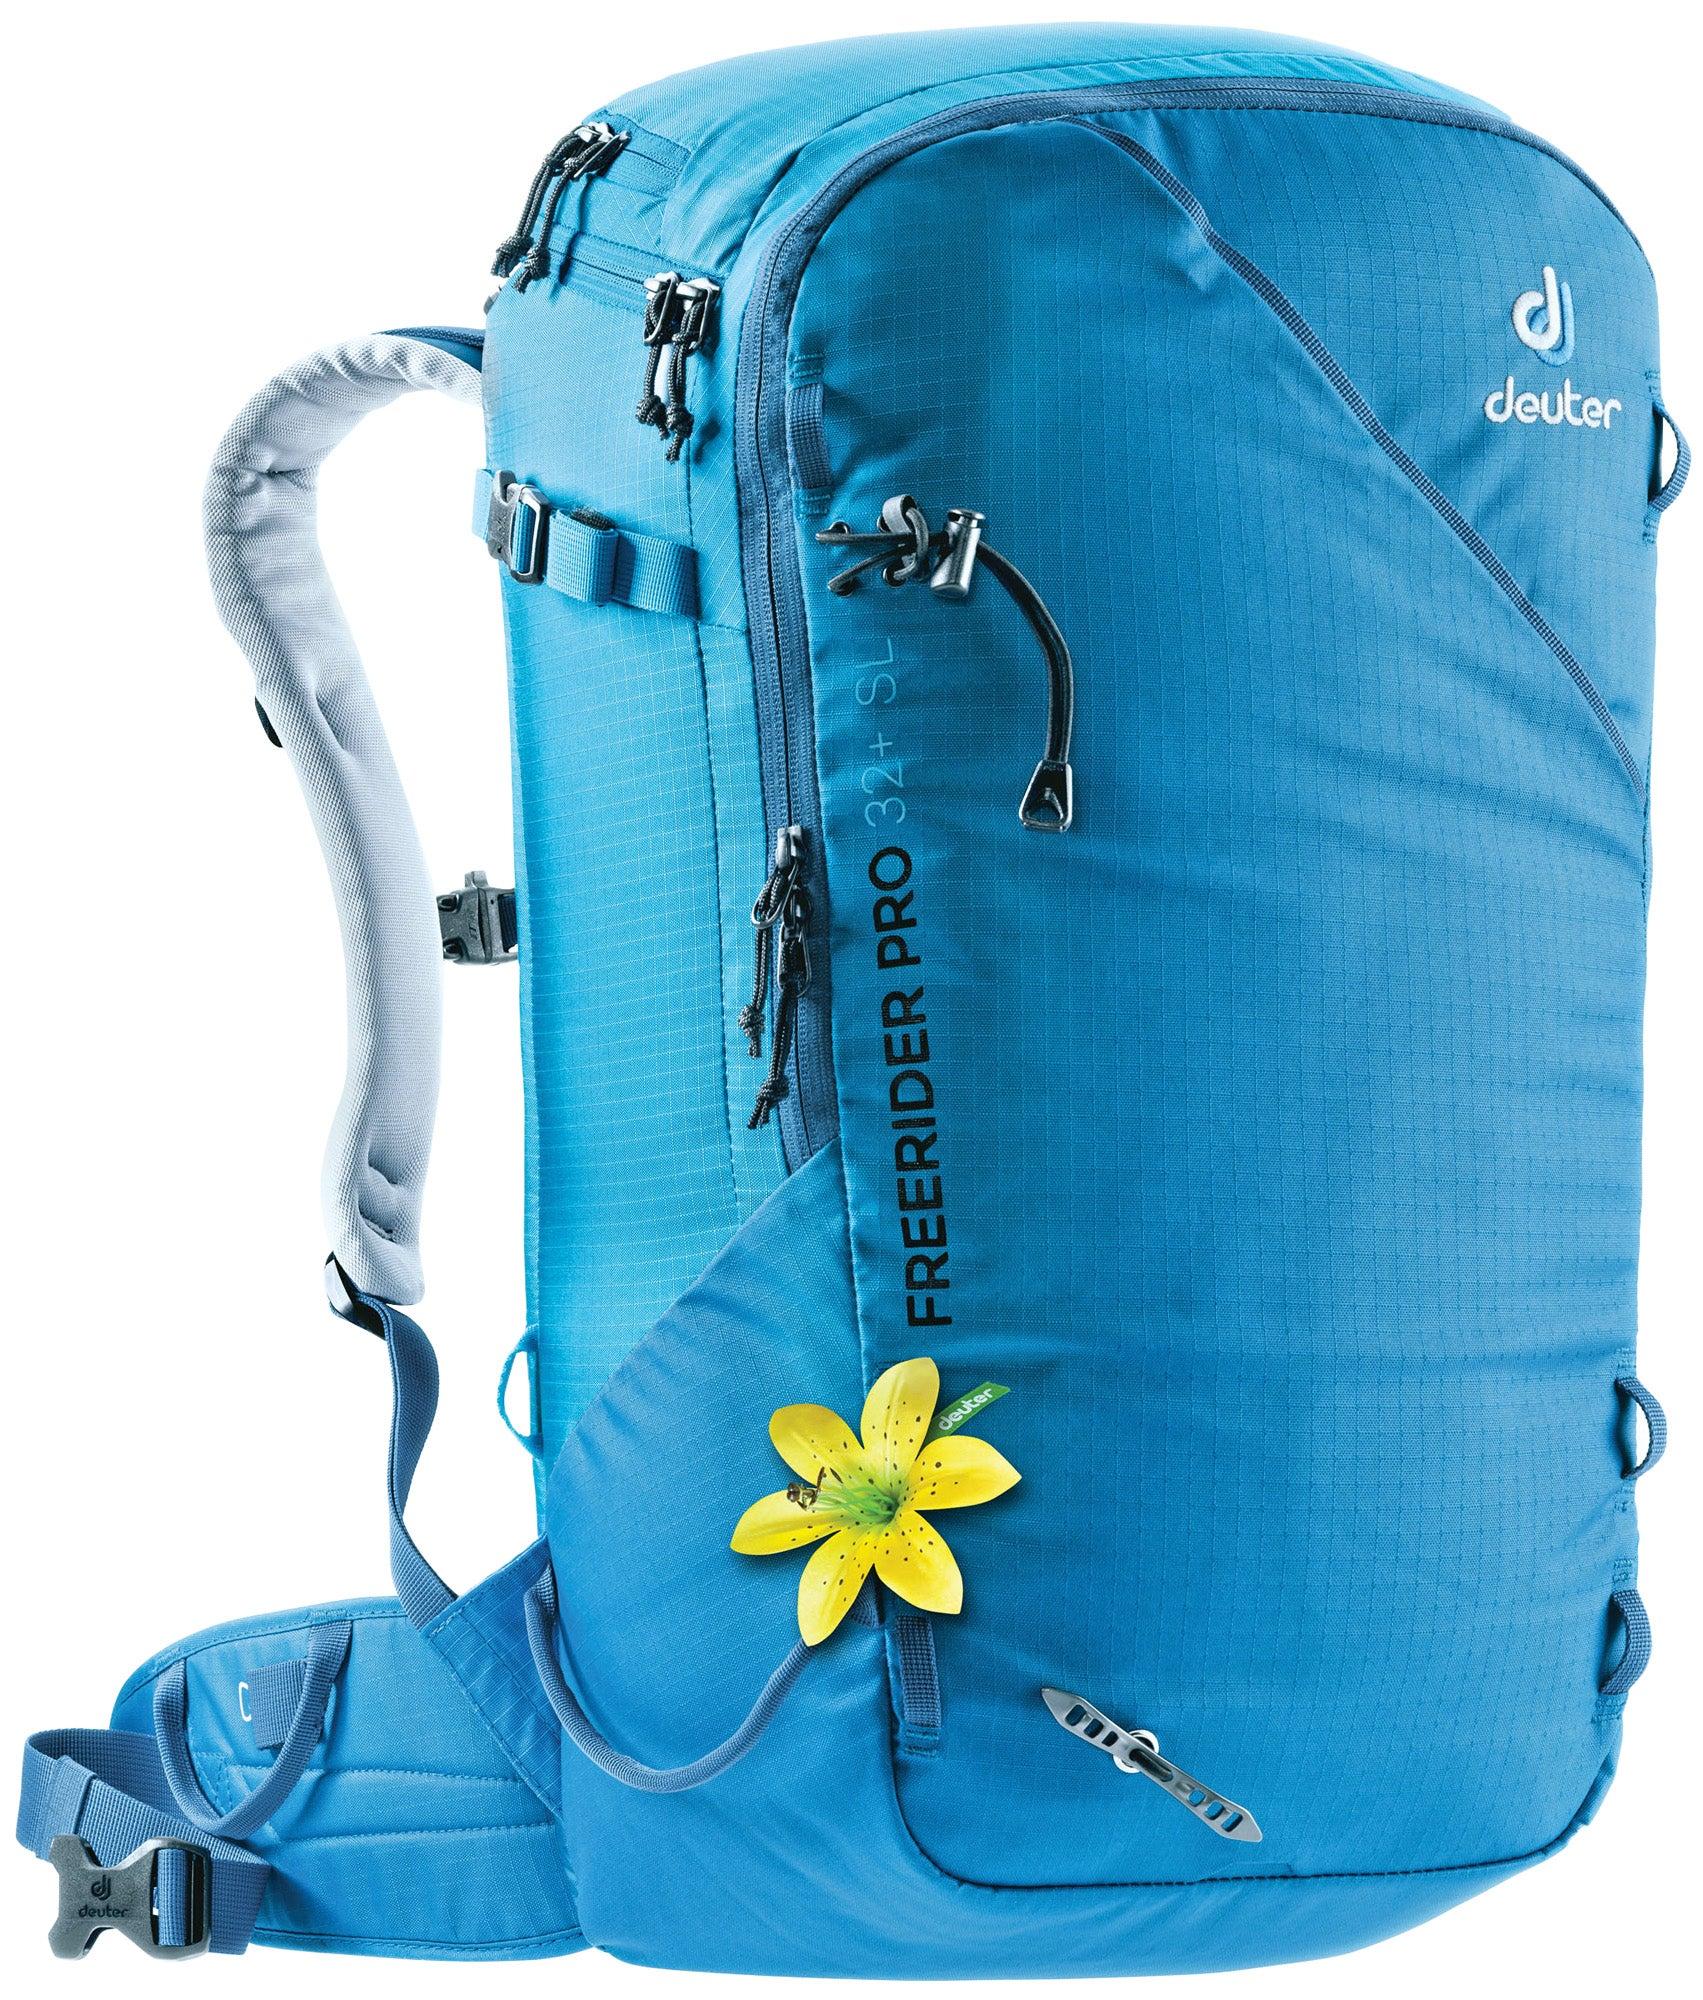 Deuter Freerider Pro 32+ SL Ski Backpack